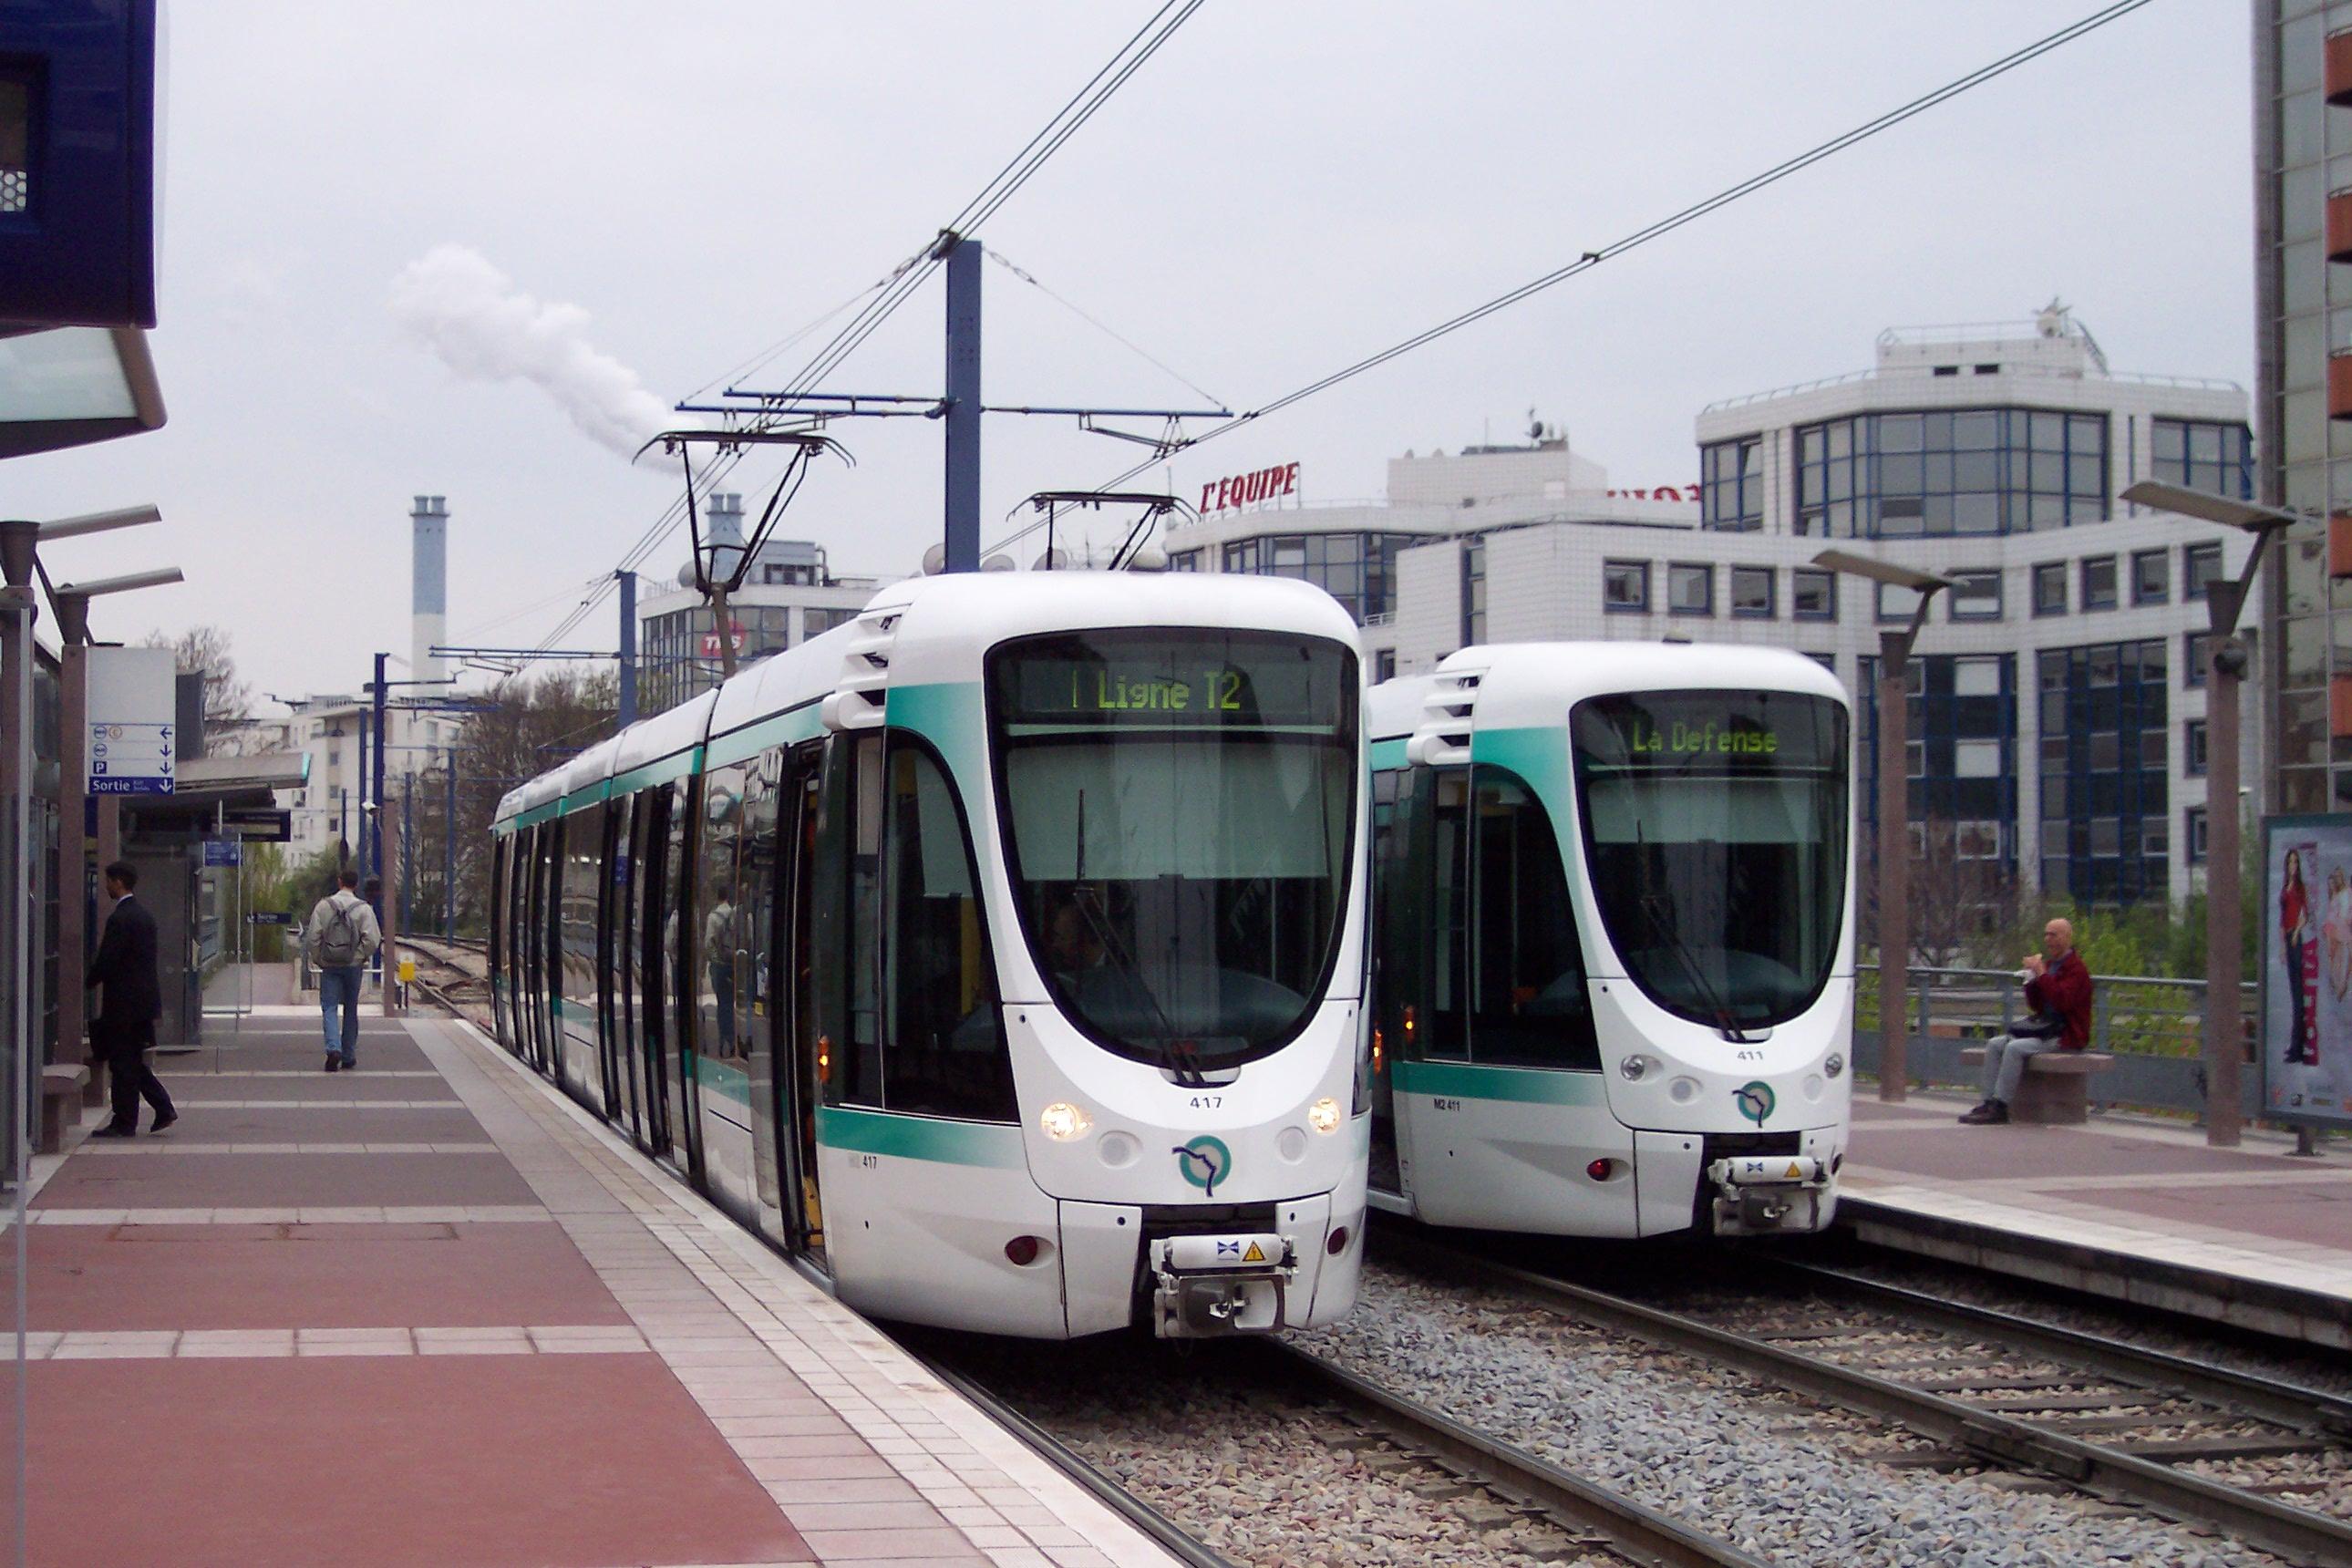 Rencontre tramway t2